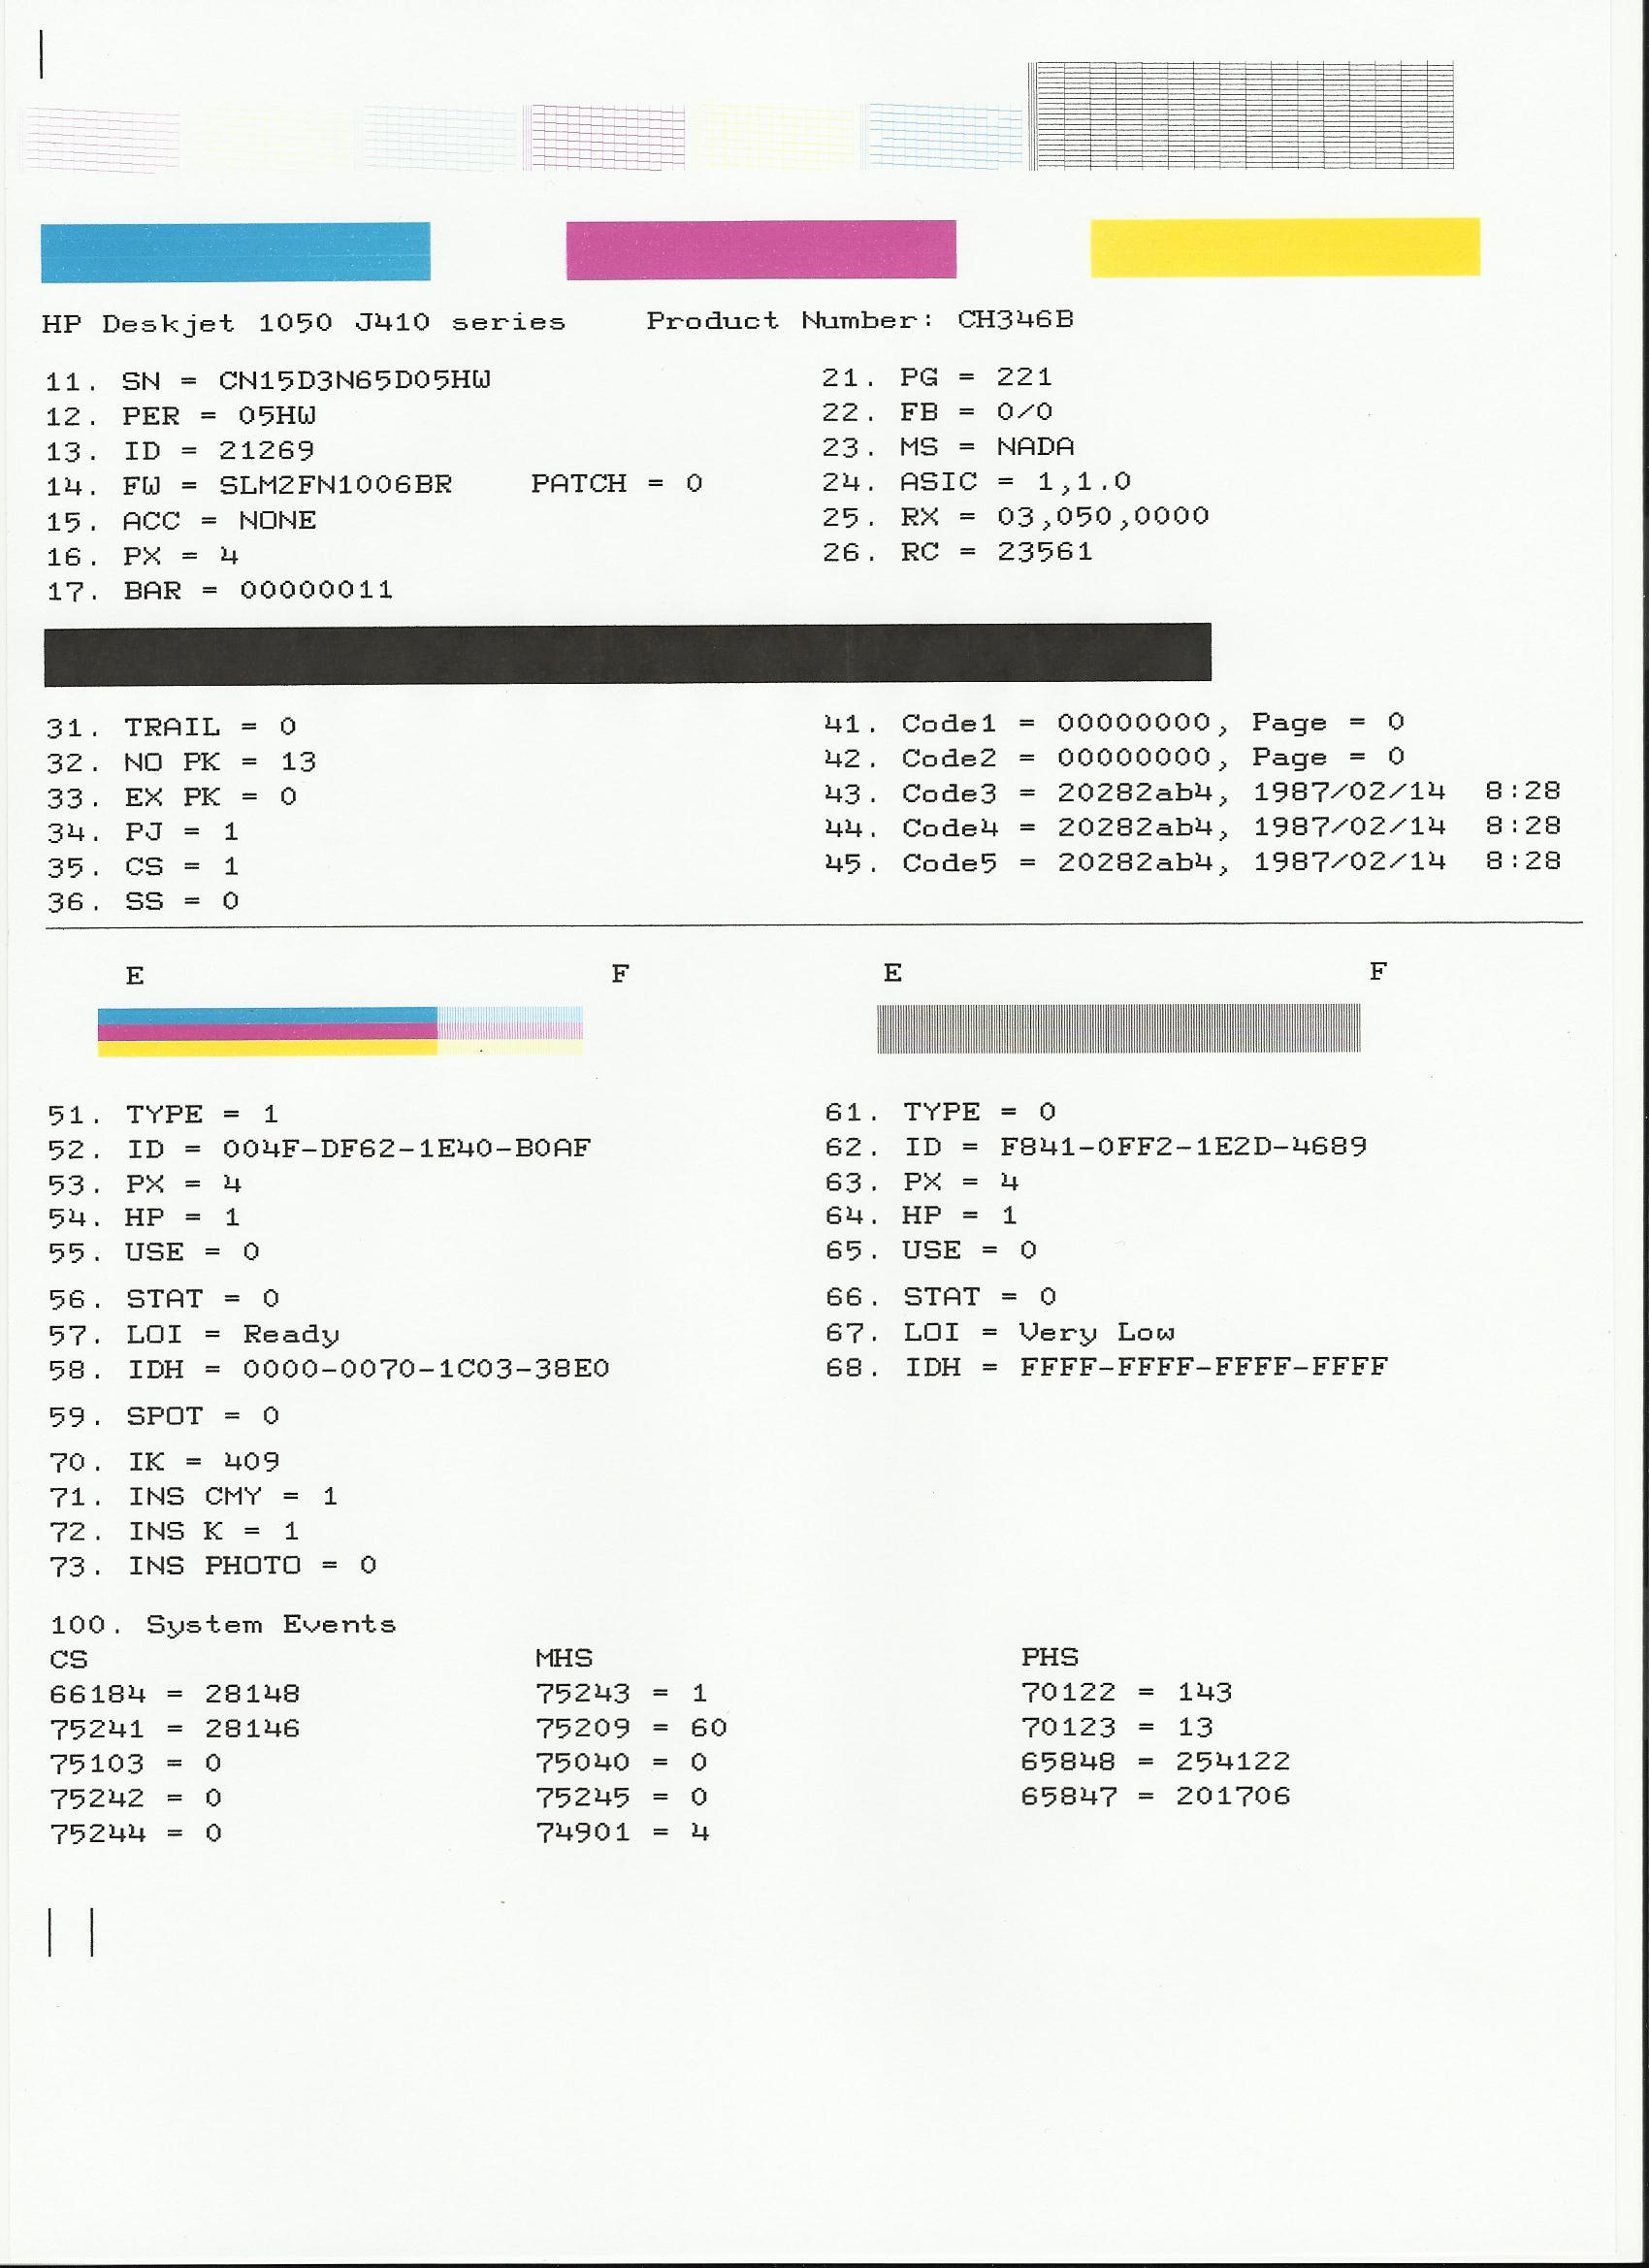 1050 J410 Imprime Pagina De Prueba Pero No Documen